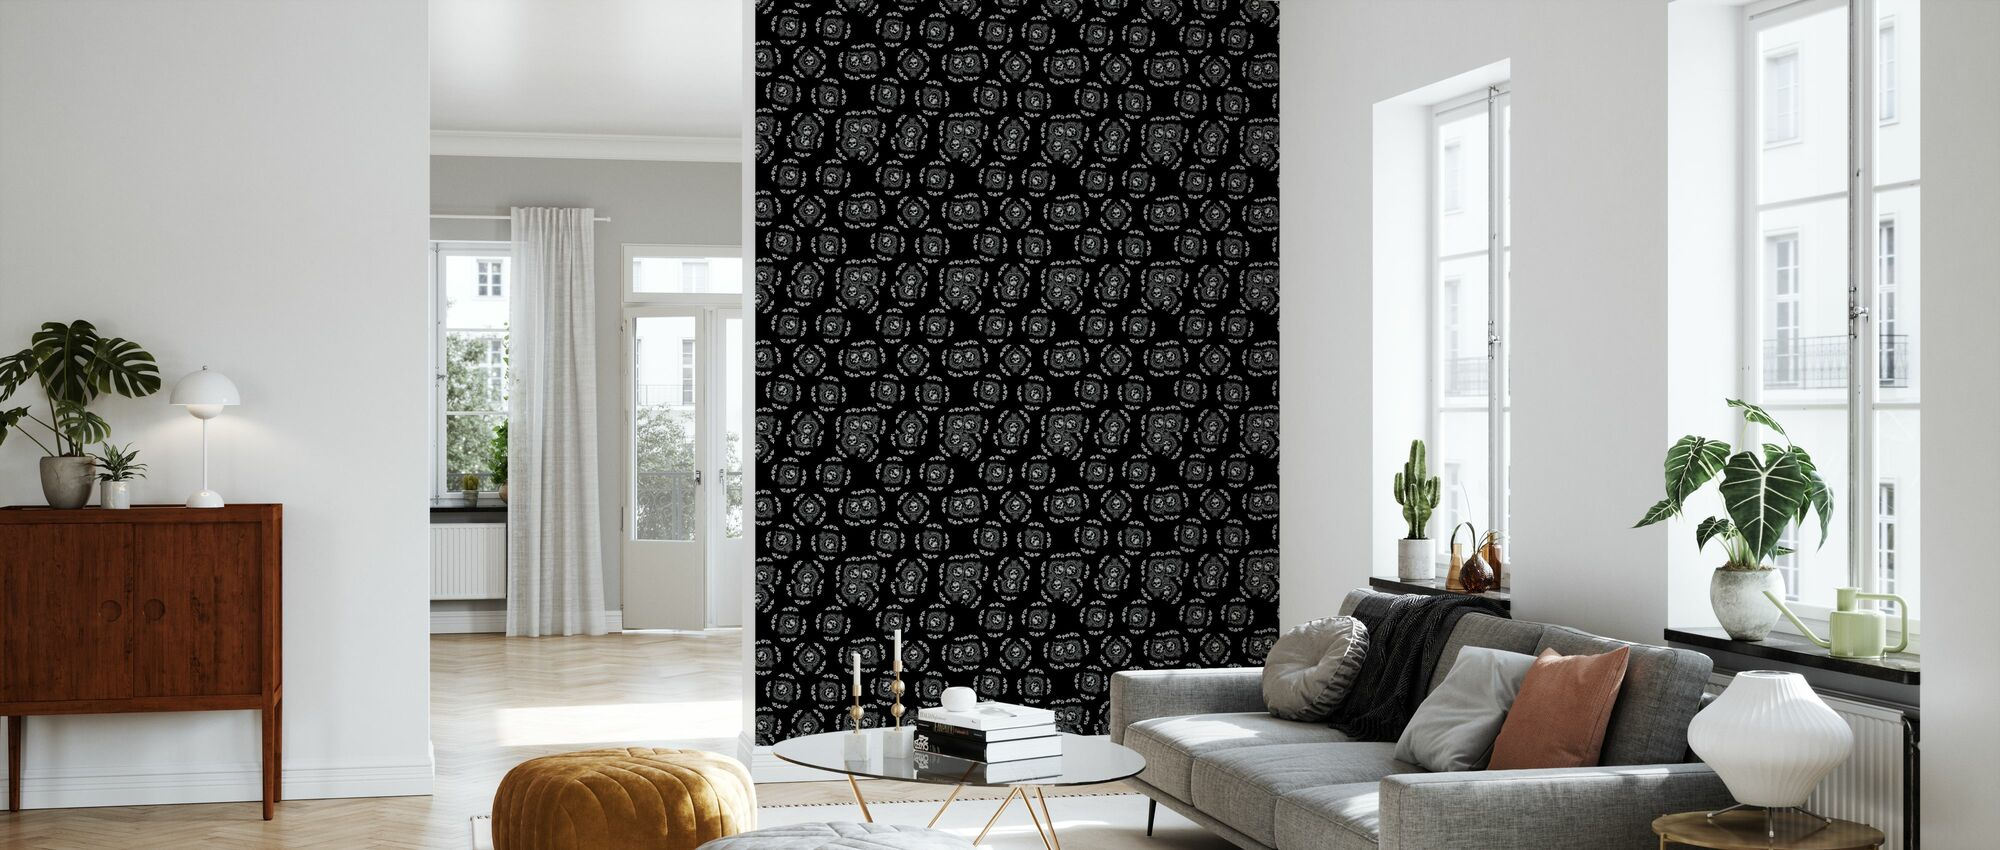 Ace Skull - Wallpaper - Living Room